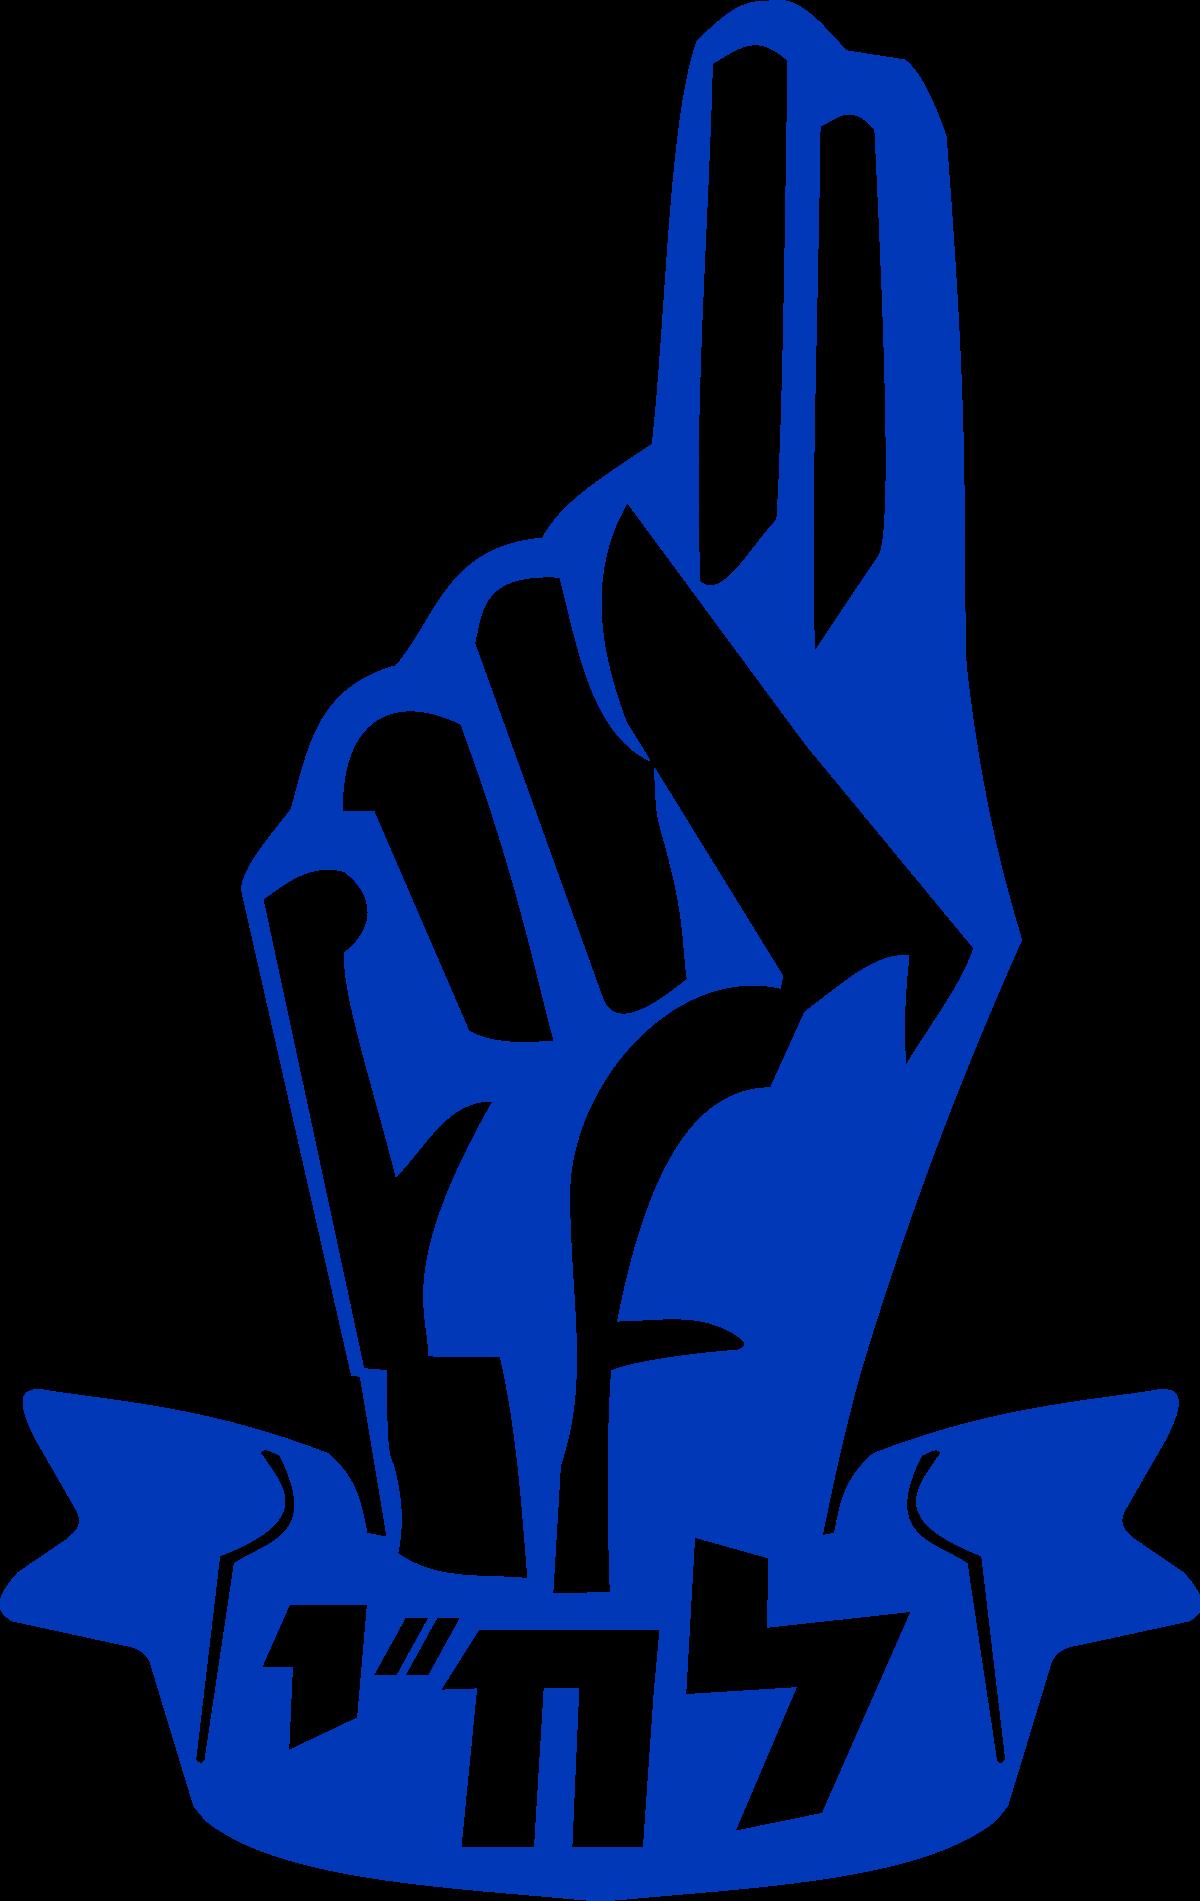 Lehi (militant group).